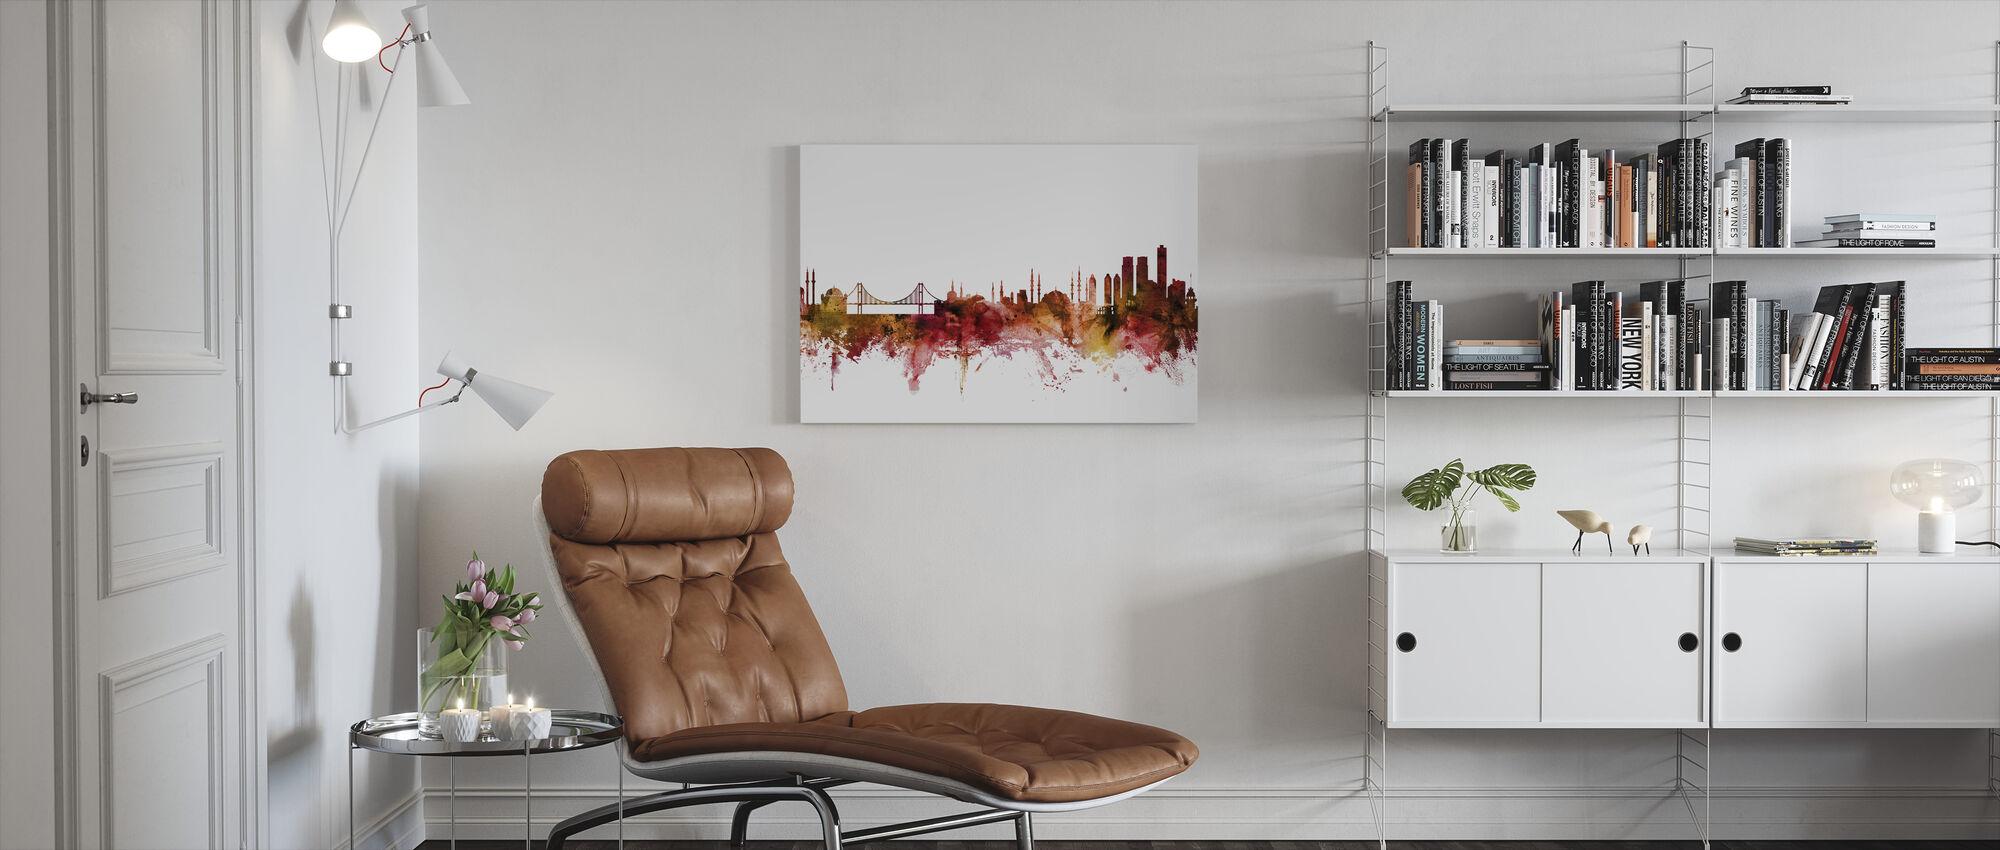 Skyline van Istanboel Turkije - Canvas print - Woonkamer